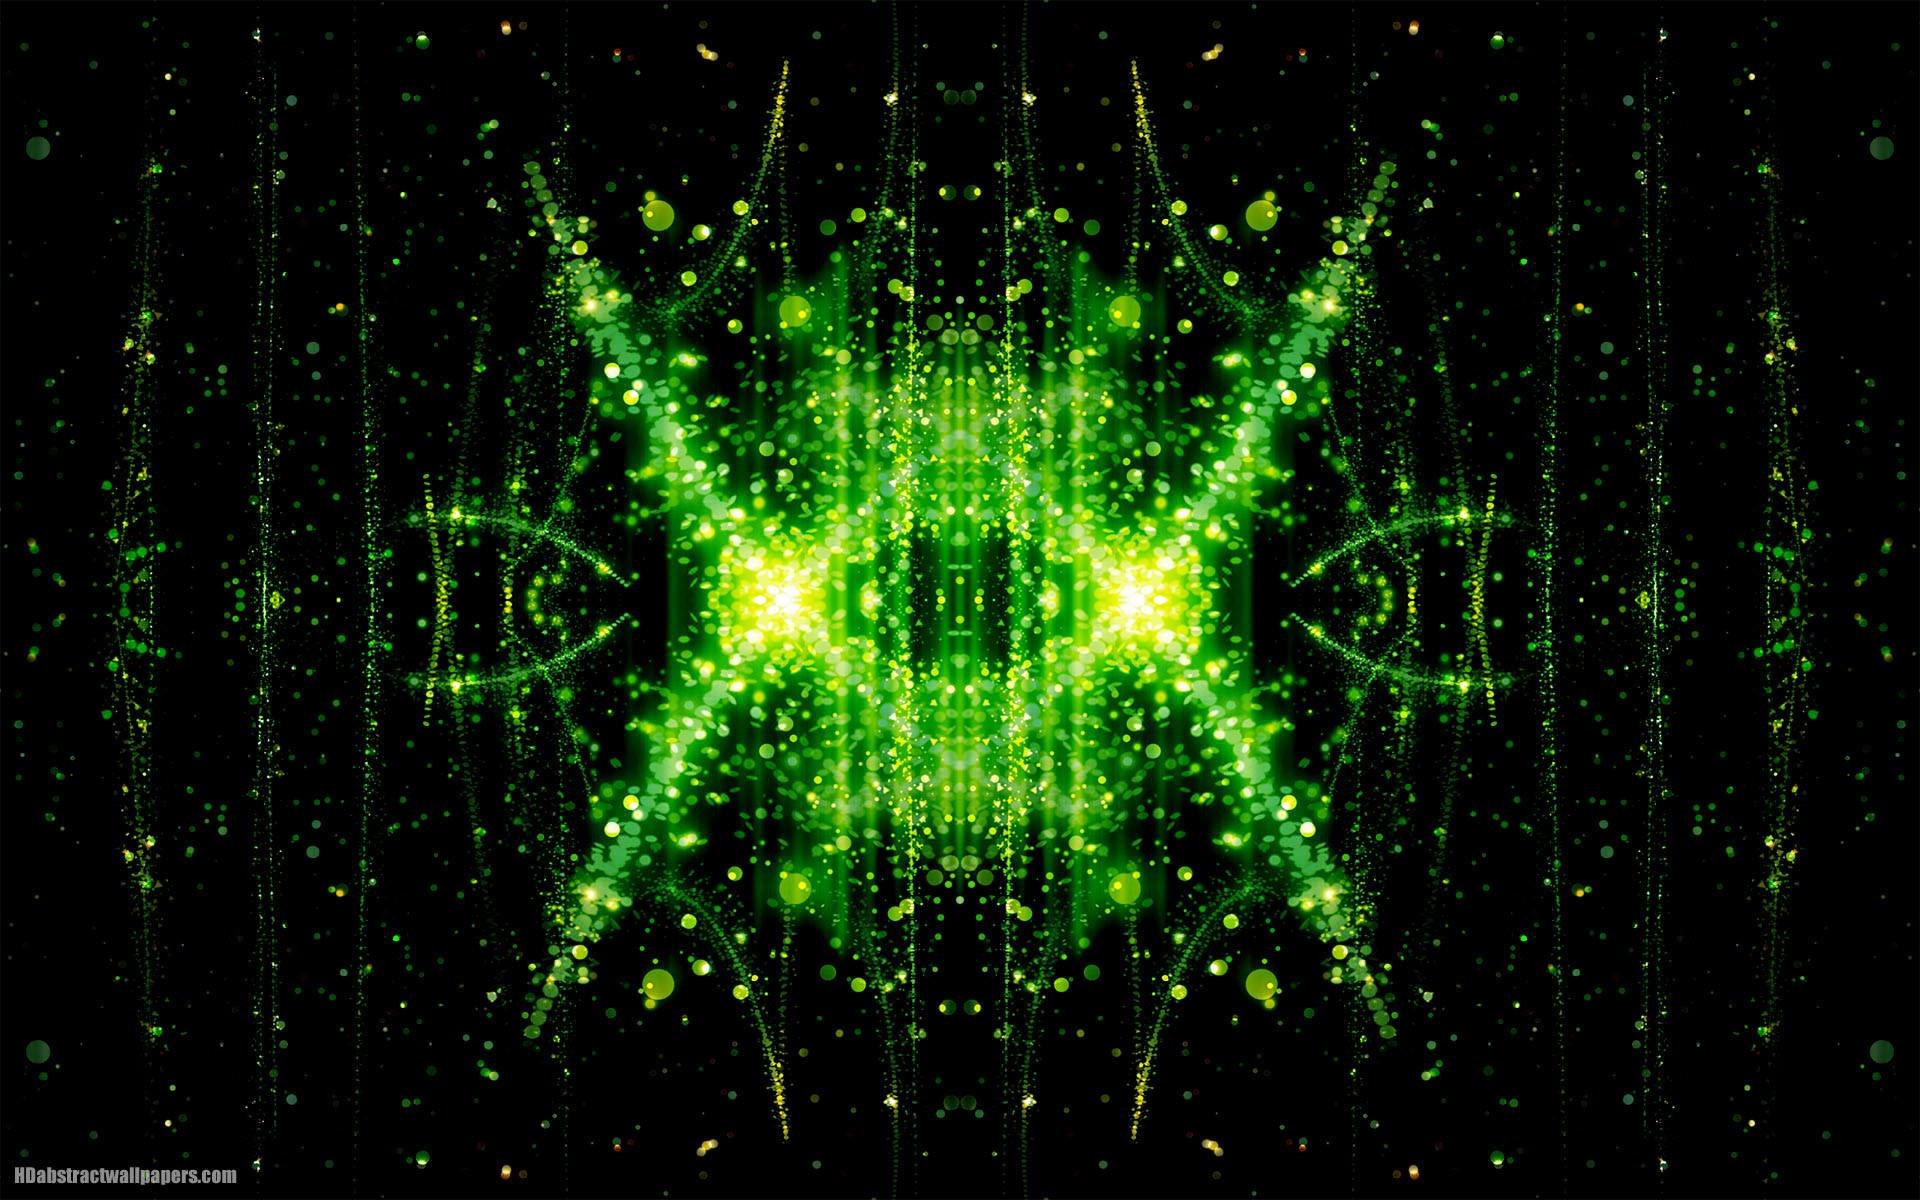 Dark abstract green wallpaper